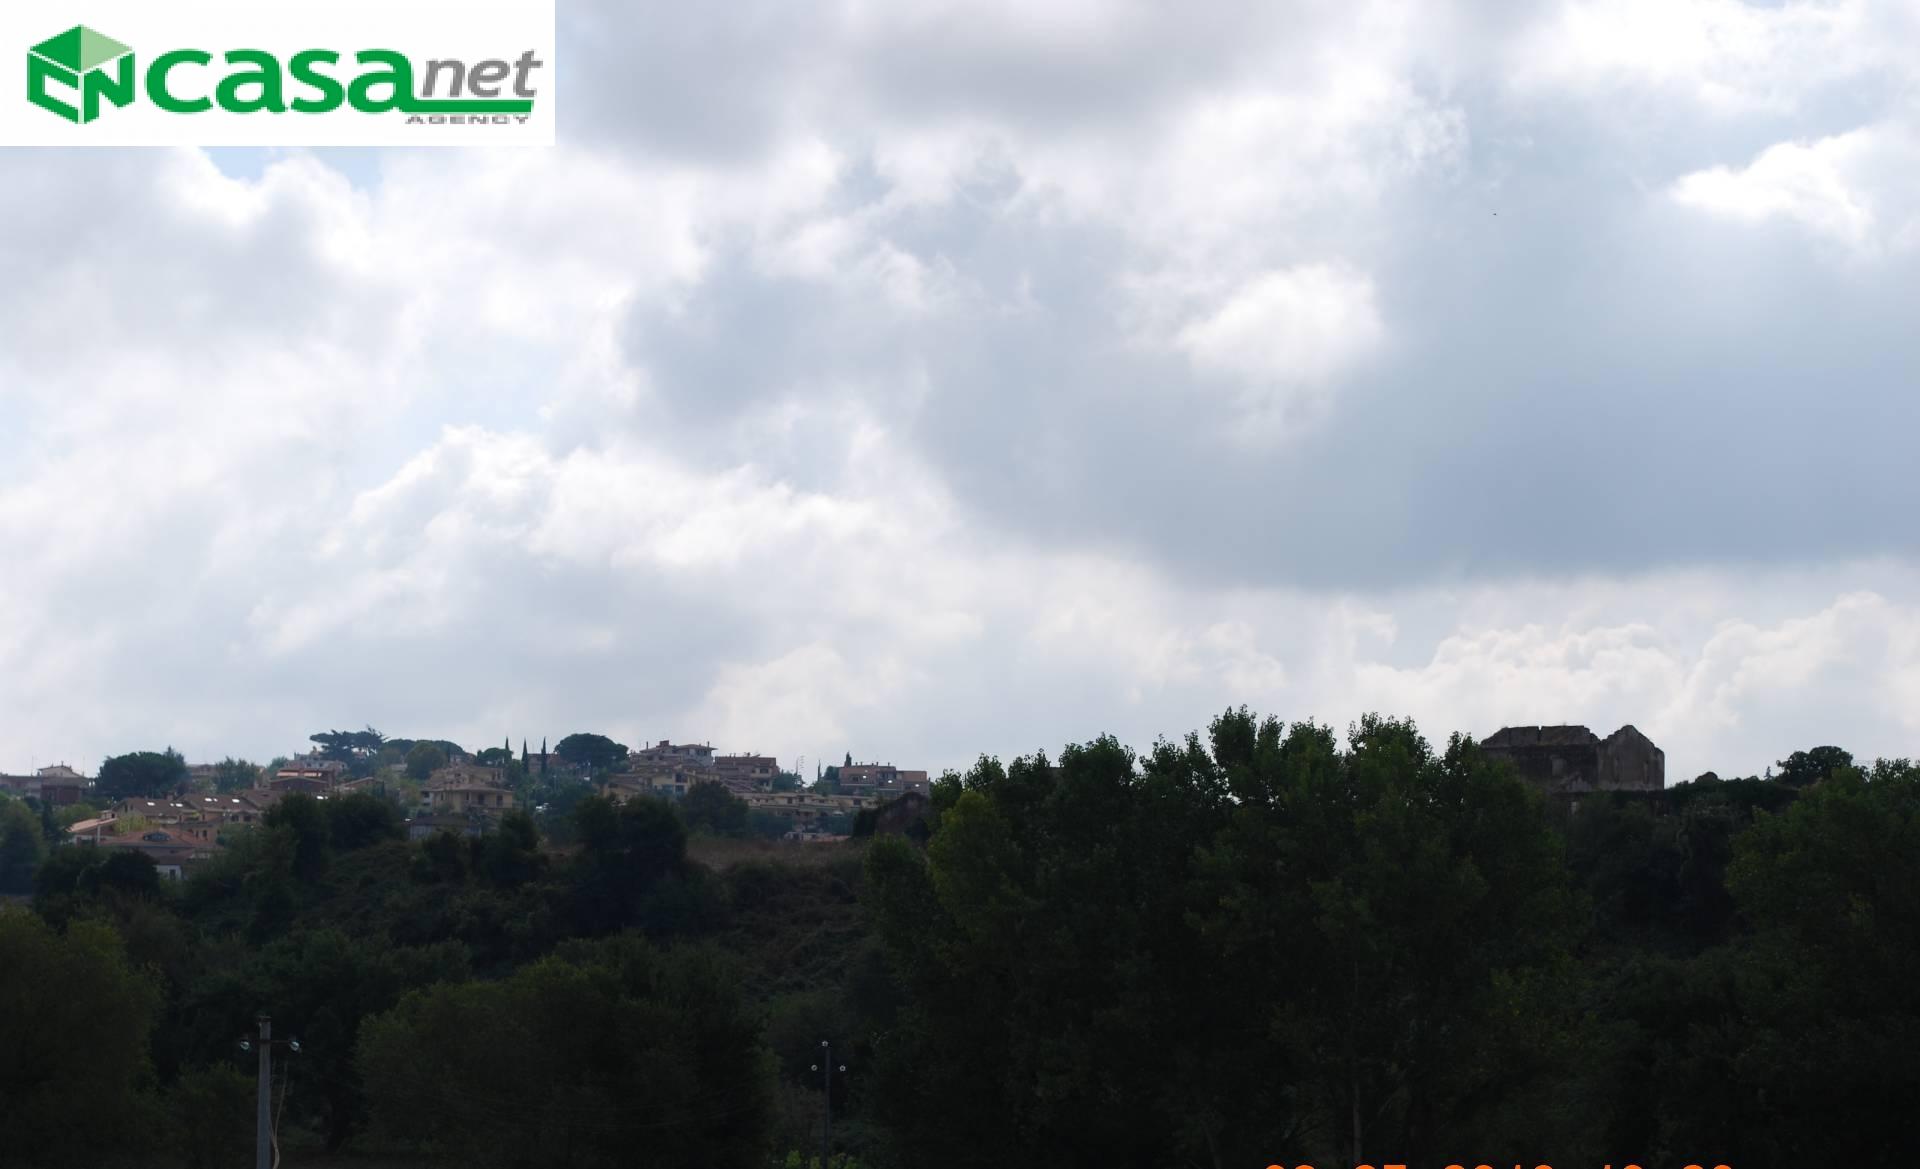 Bilocale Guidonia Montecelio Via Palombarese 10